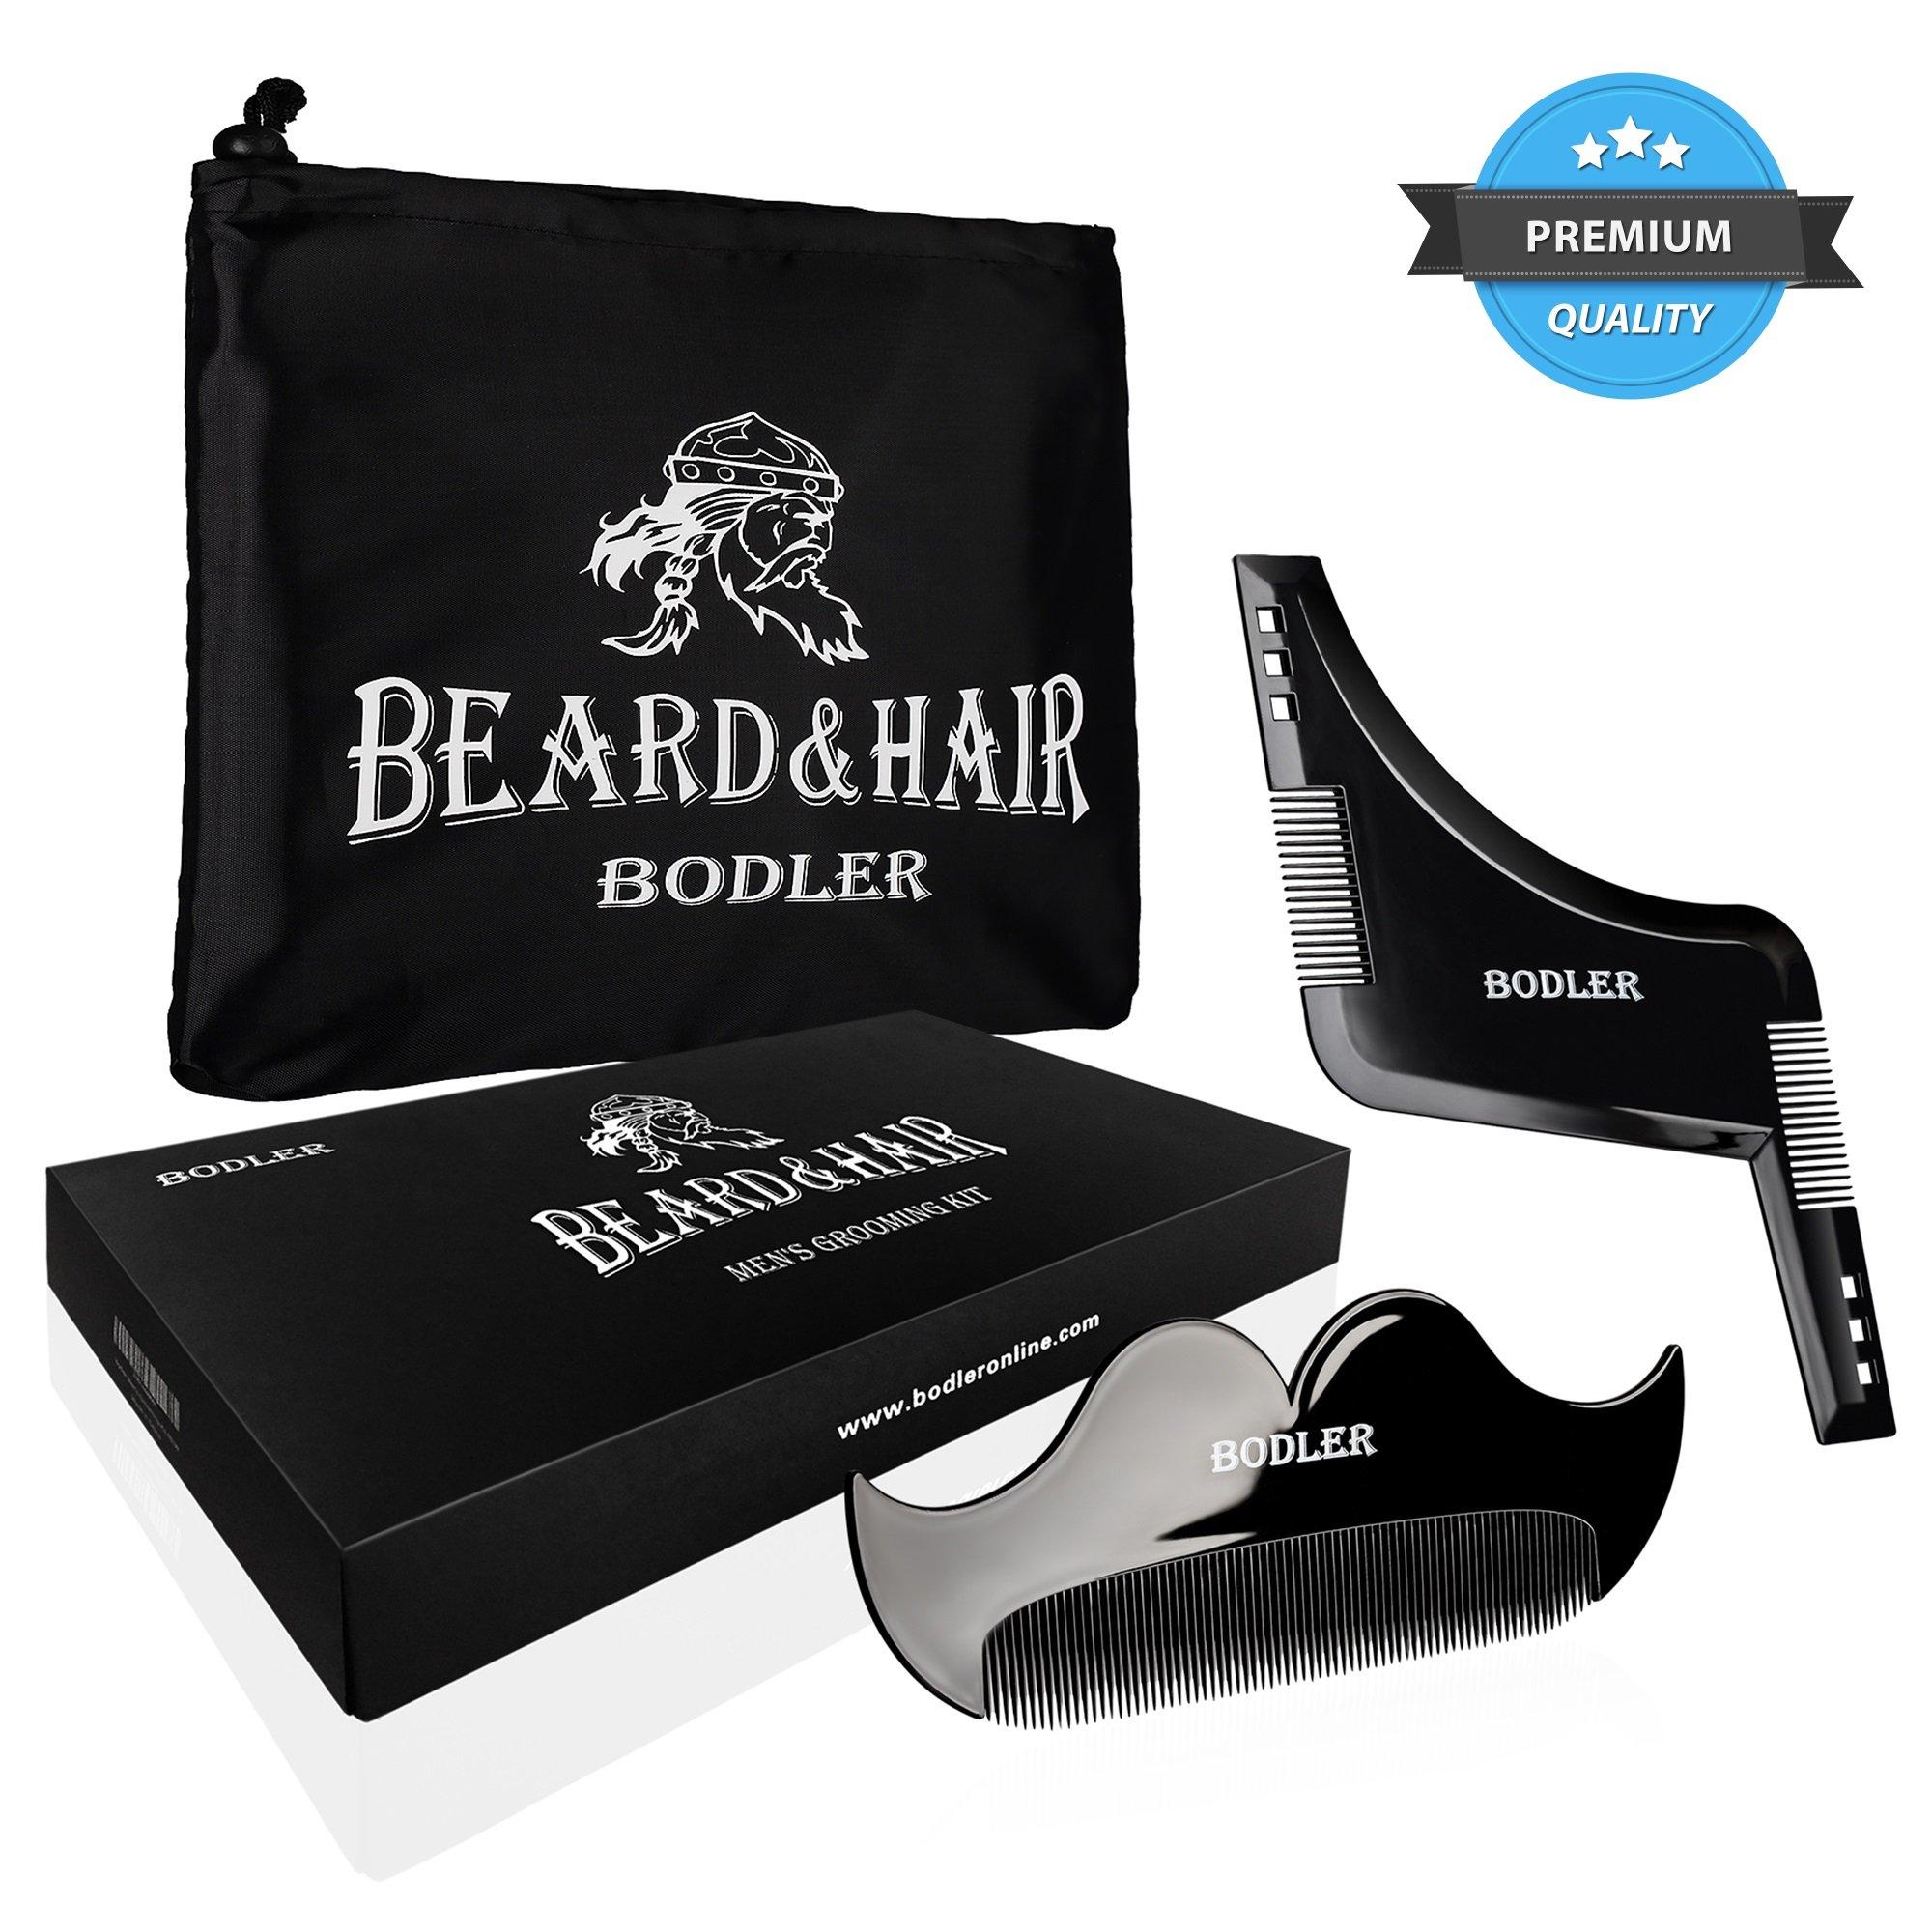 Beard Bib & Beard Shaper Guide For Line Up & Edging - Grooming & Shaving Kit For Men - Trim Your Beard Like a Pro With Goatee Shaping Tool Template & Beard Apron Cape Set - Nice Gift Box Packaging